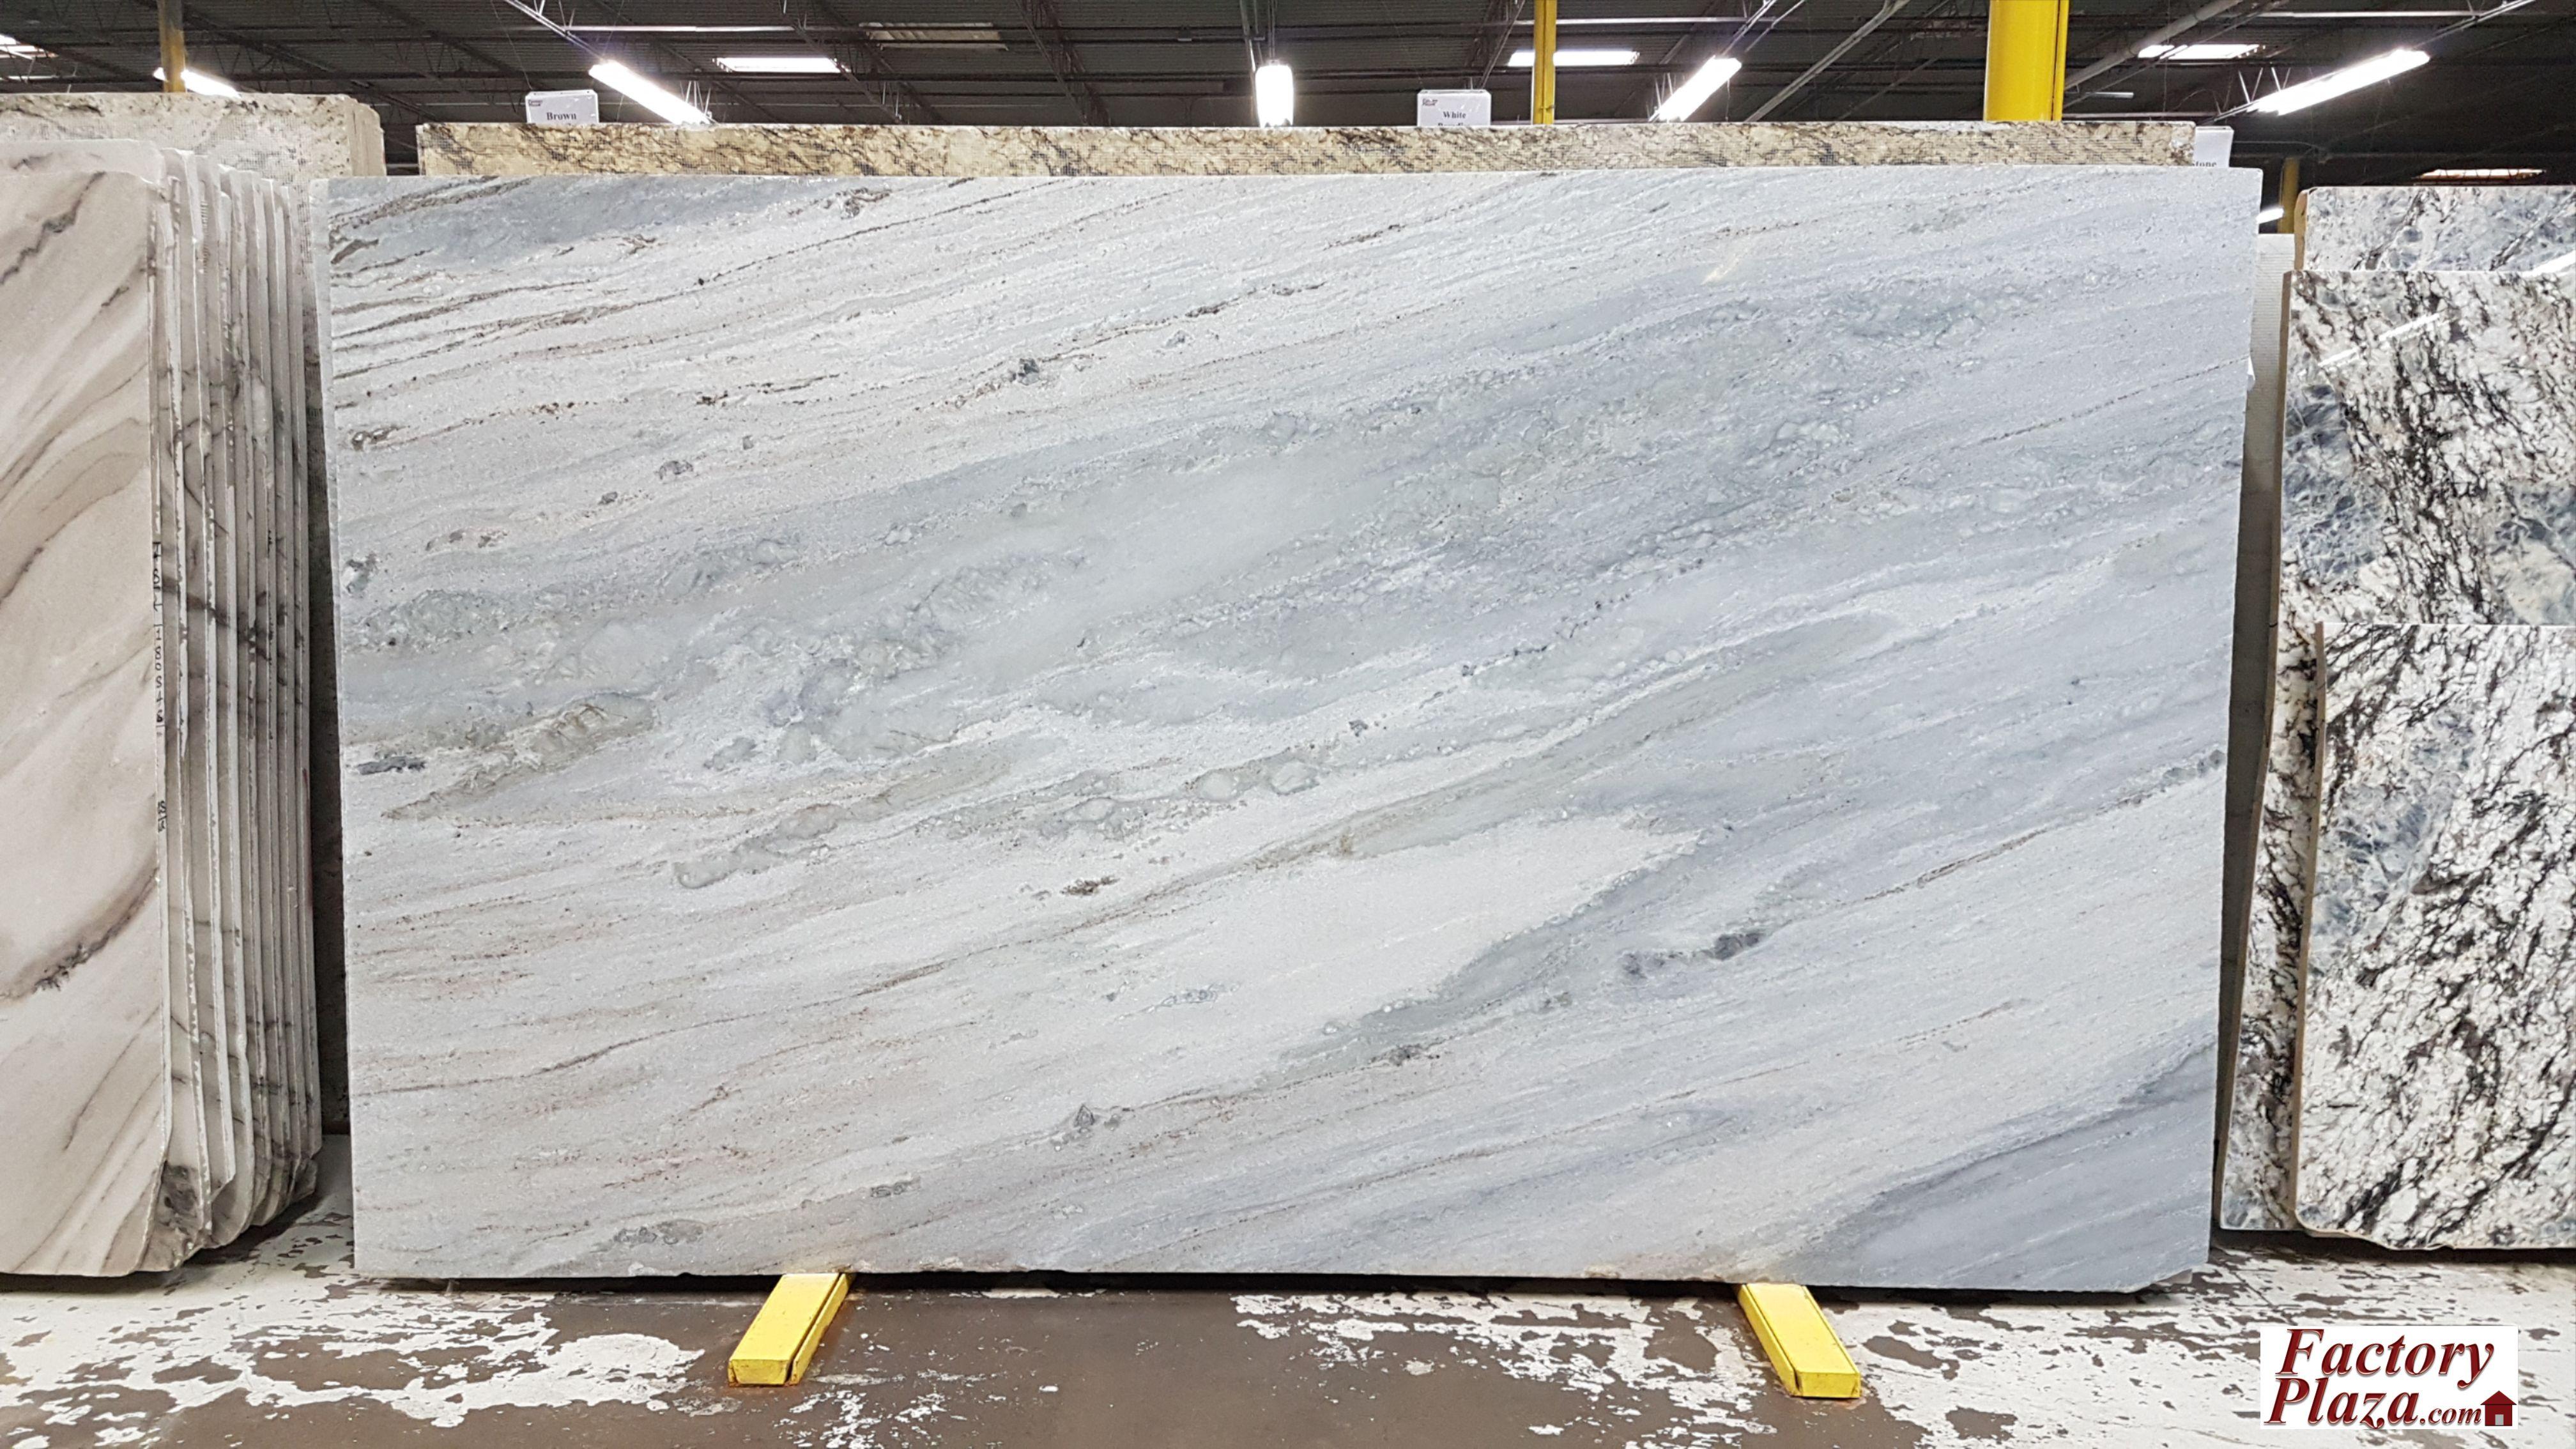 What Do You Think Factory Plaza Granite Marble Quartz